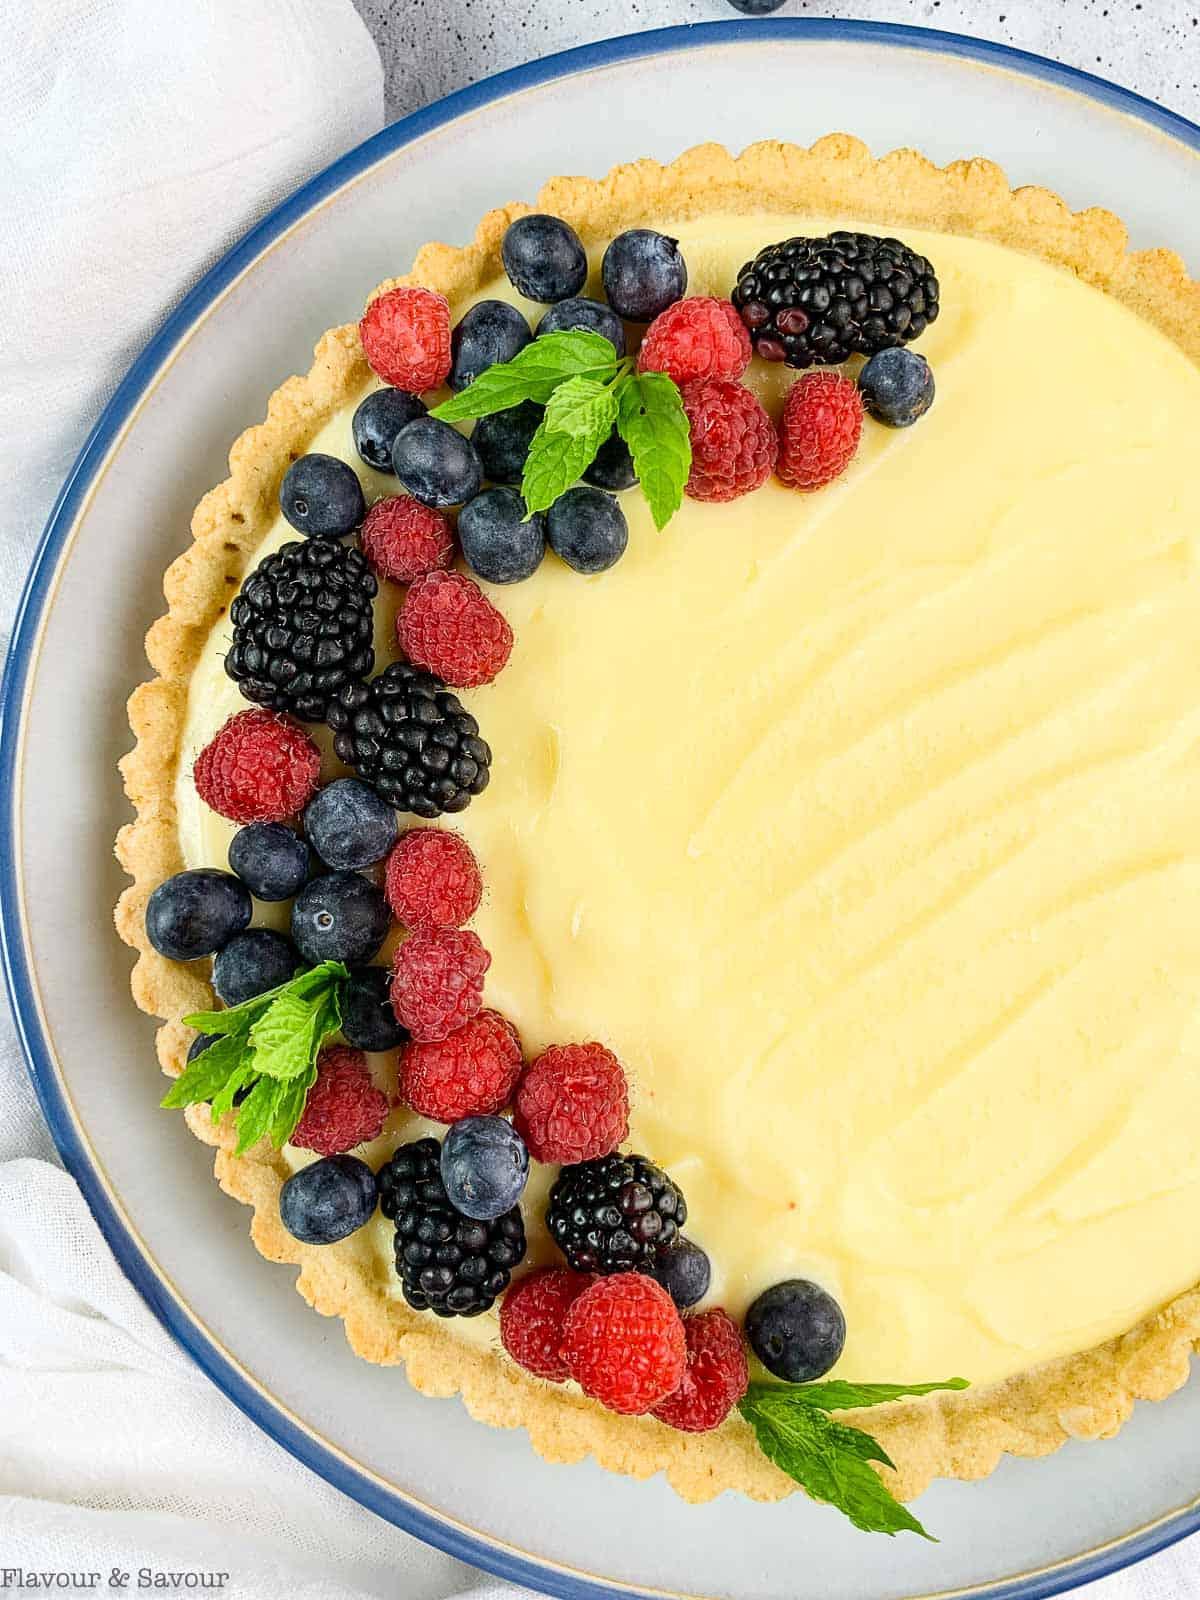 Overhead view of gluten-free lemon curd tart with fresh berries